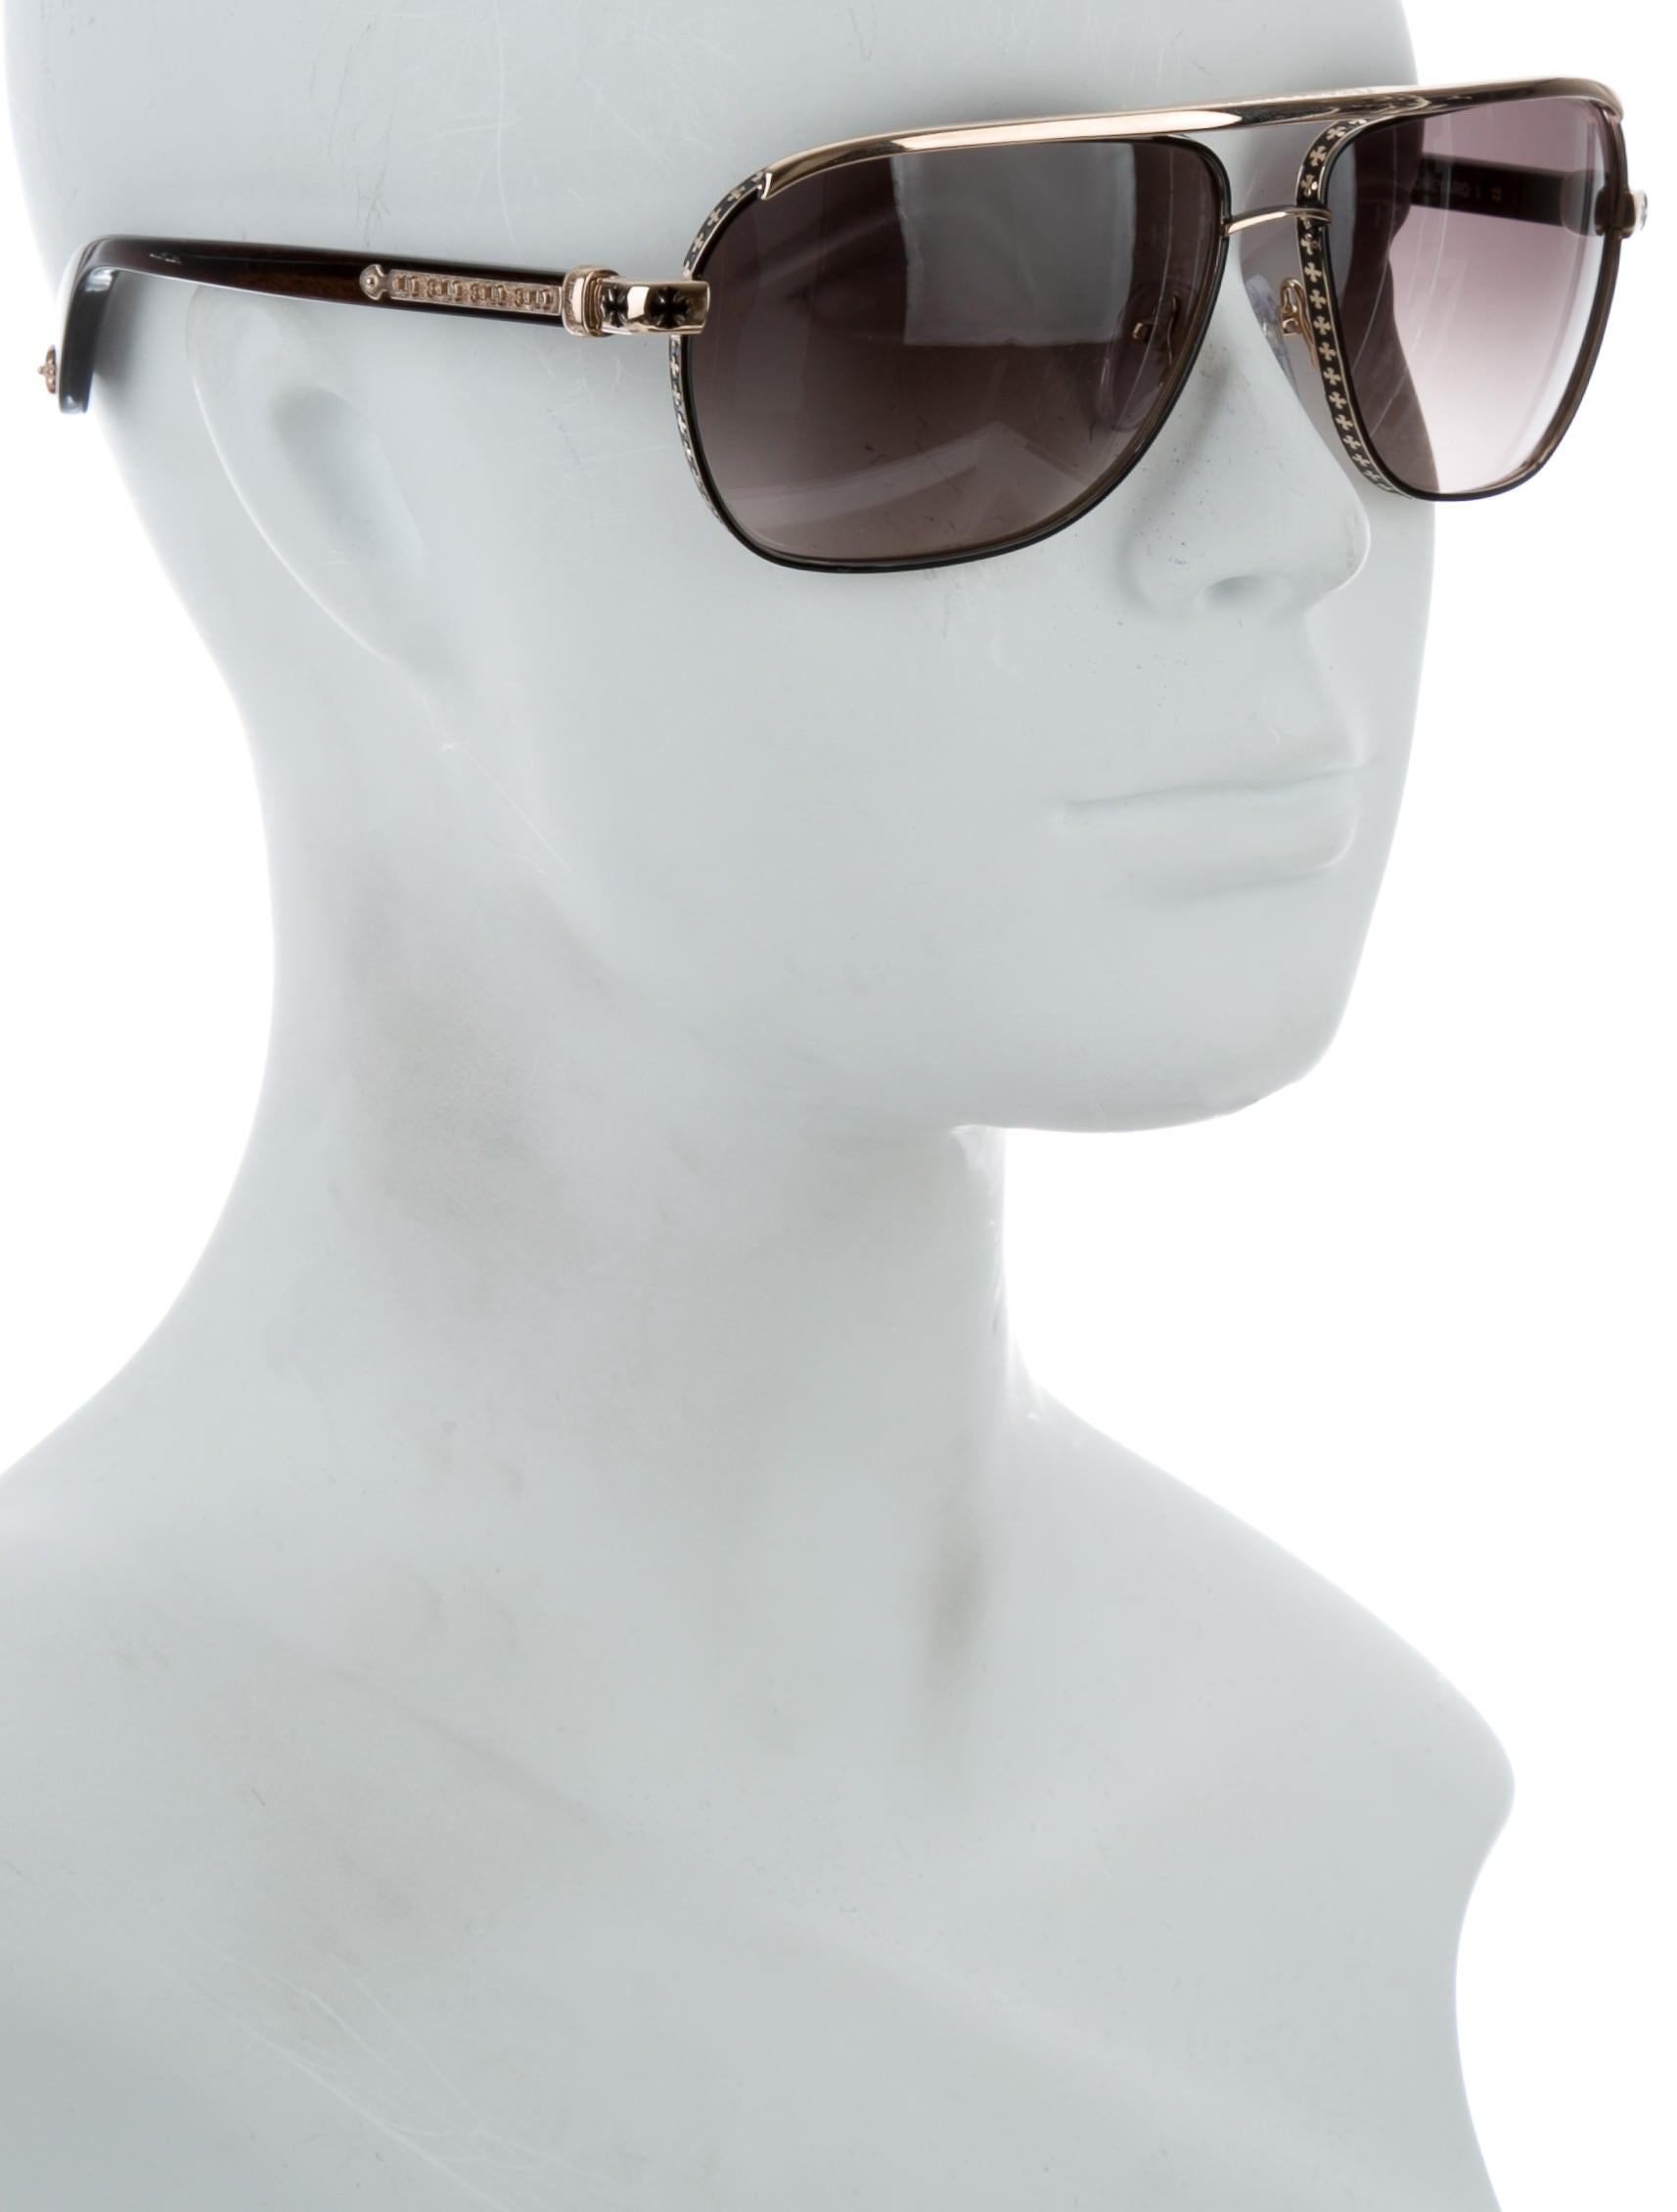 7389a2c9672 Chrome Hearts Sunglasses Boneyard